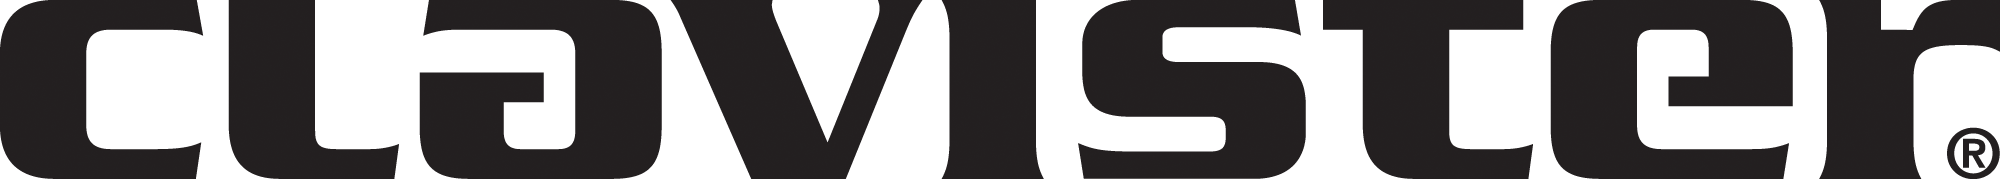 Clavister_logo.png